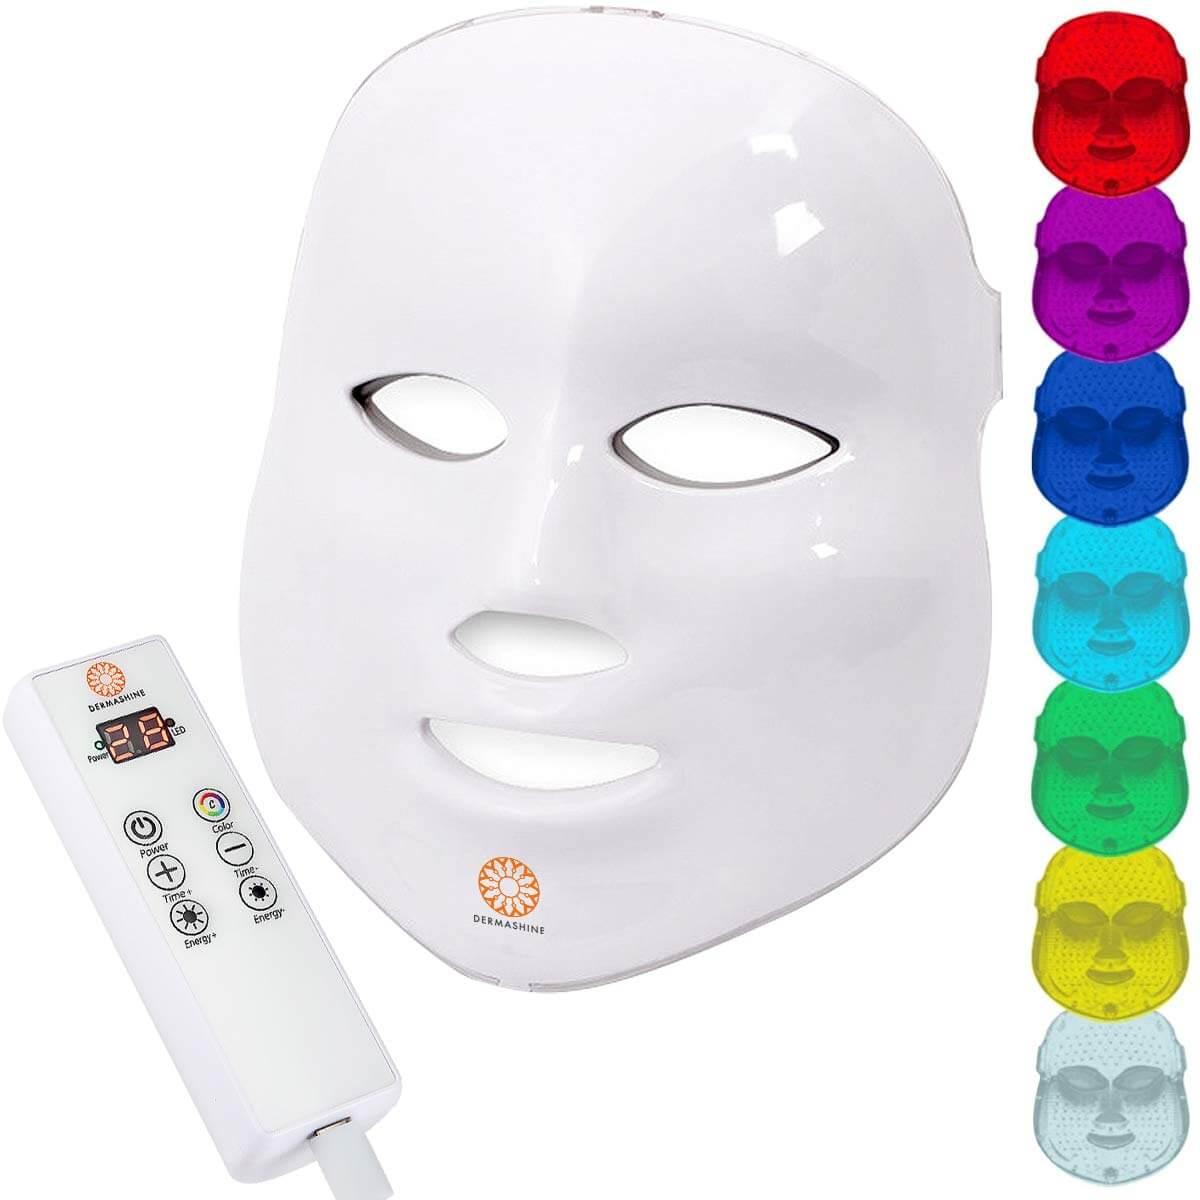 Dermashine Pro 7 - At home Therrapy Led mask Facial Kit